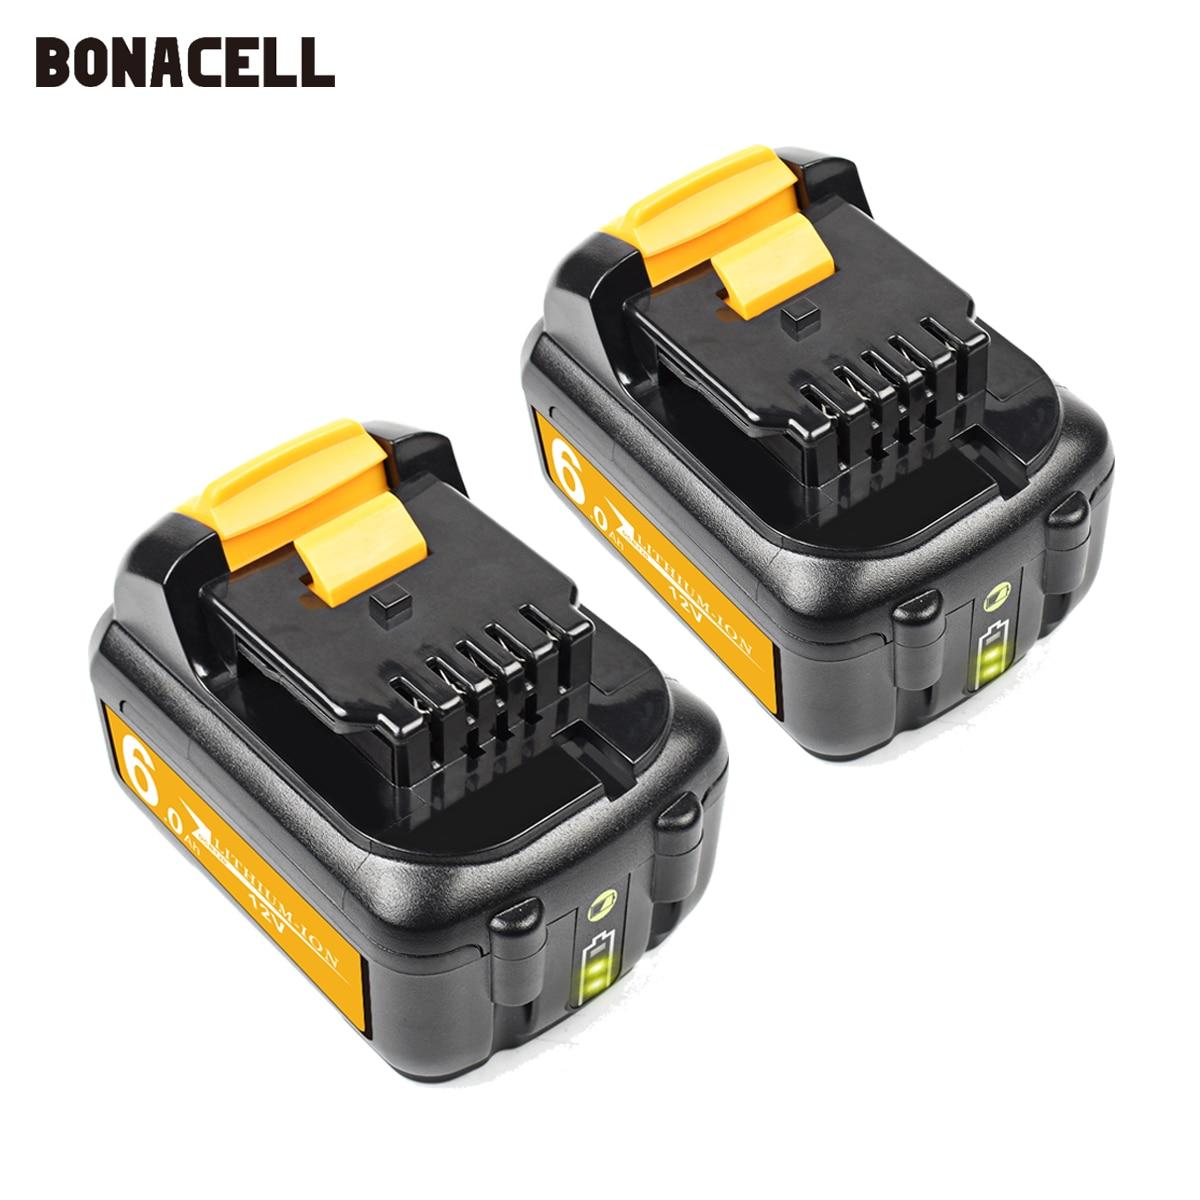 Сменный аккумулятор 6000 мАч DCB120 для Dewalt 12 в MAX Li-Ion DCB120 DCB121 DCB123 DCB125 DCD710 DCF813 DCF815, аккумулятор для электроинструмента